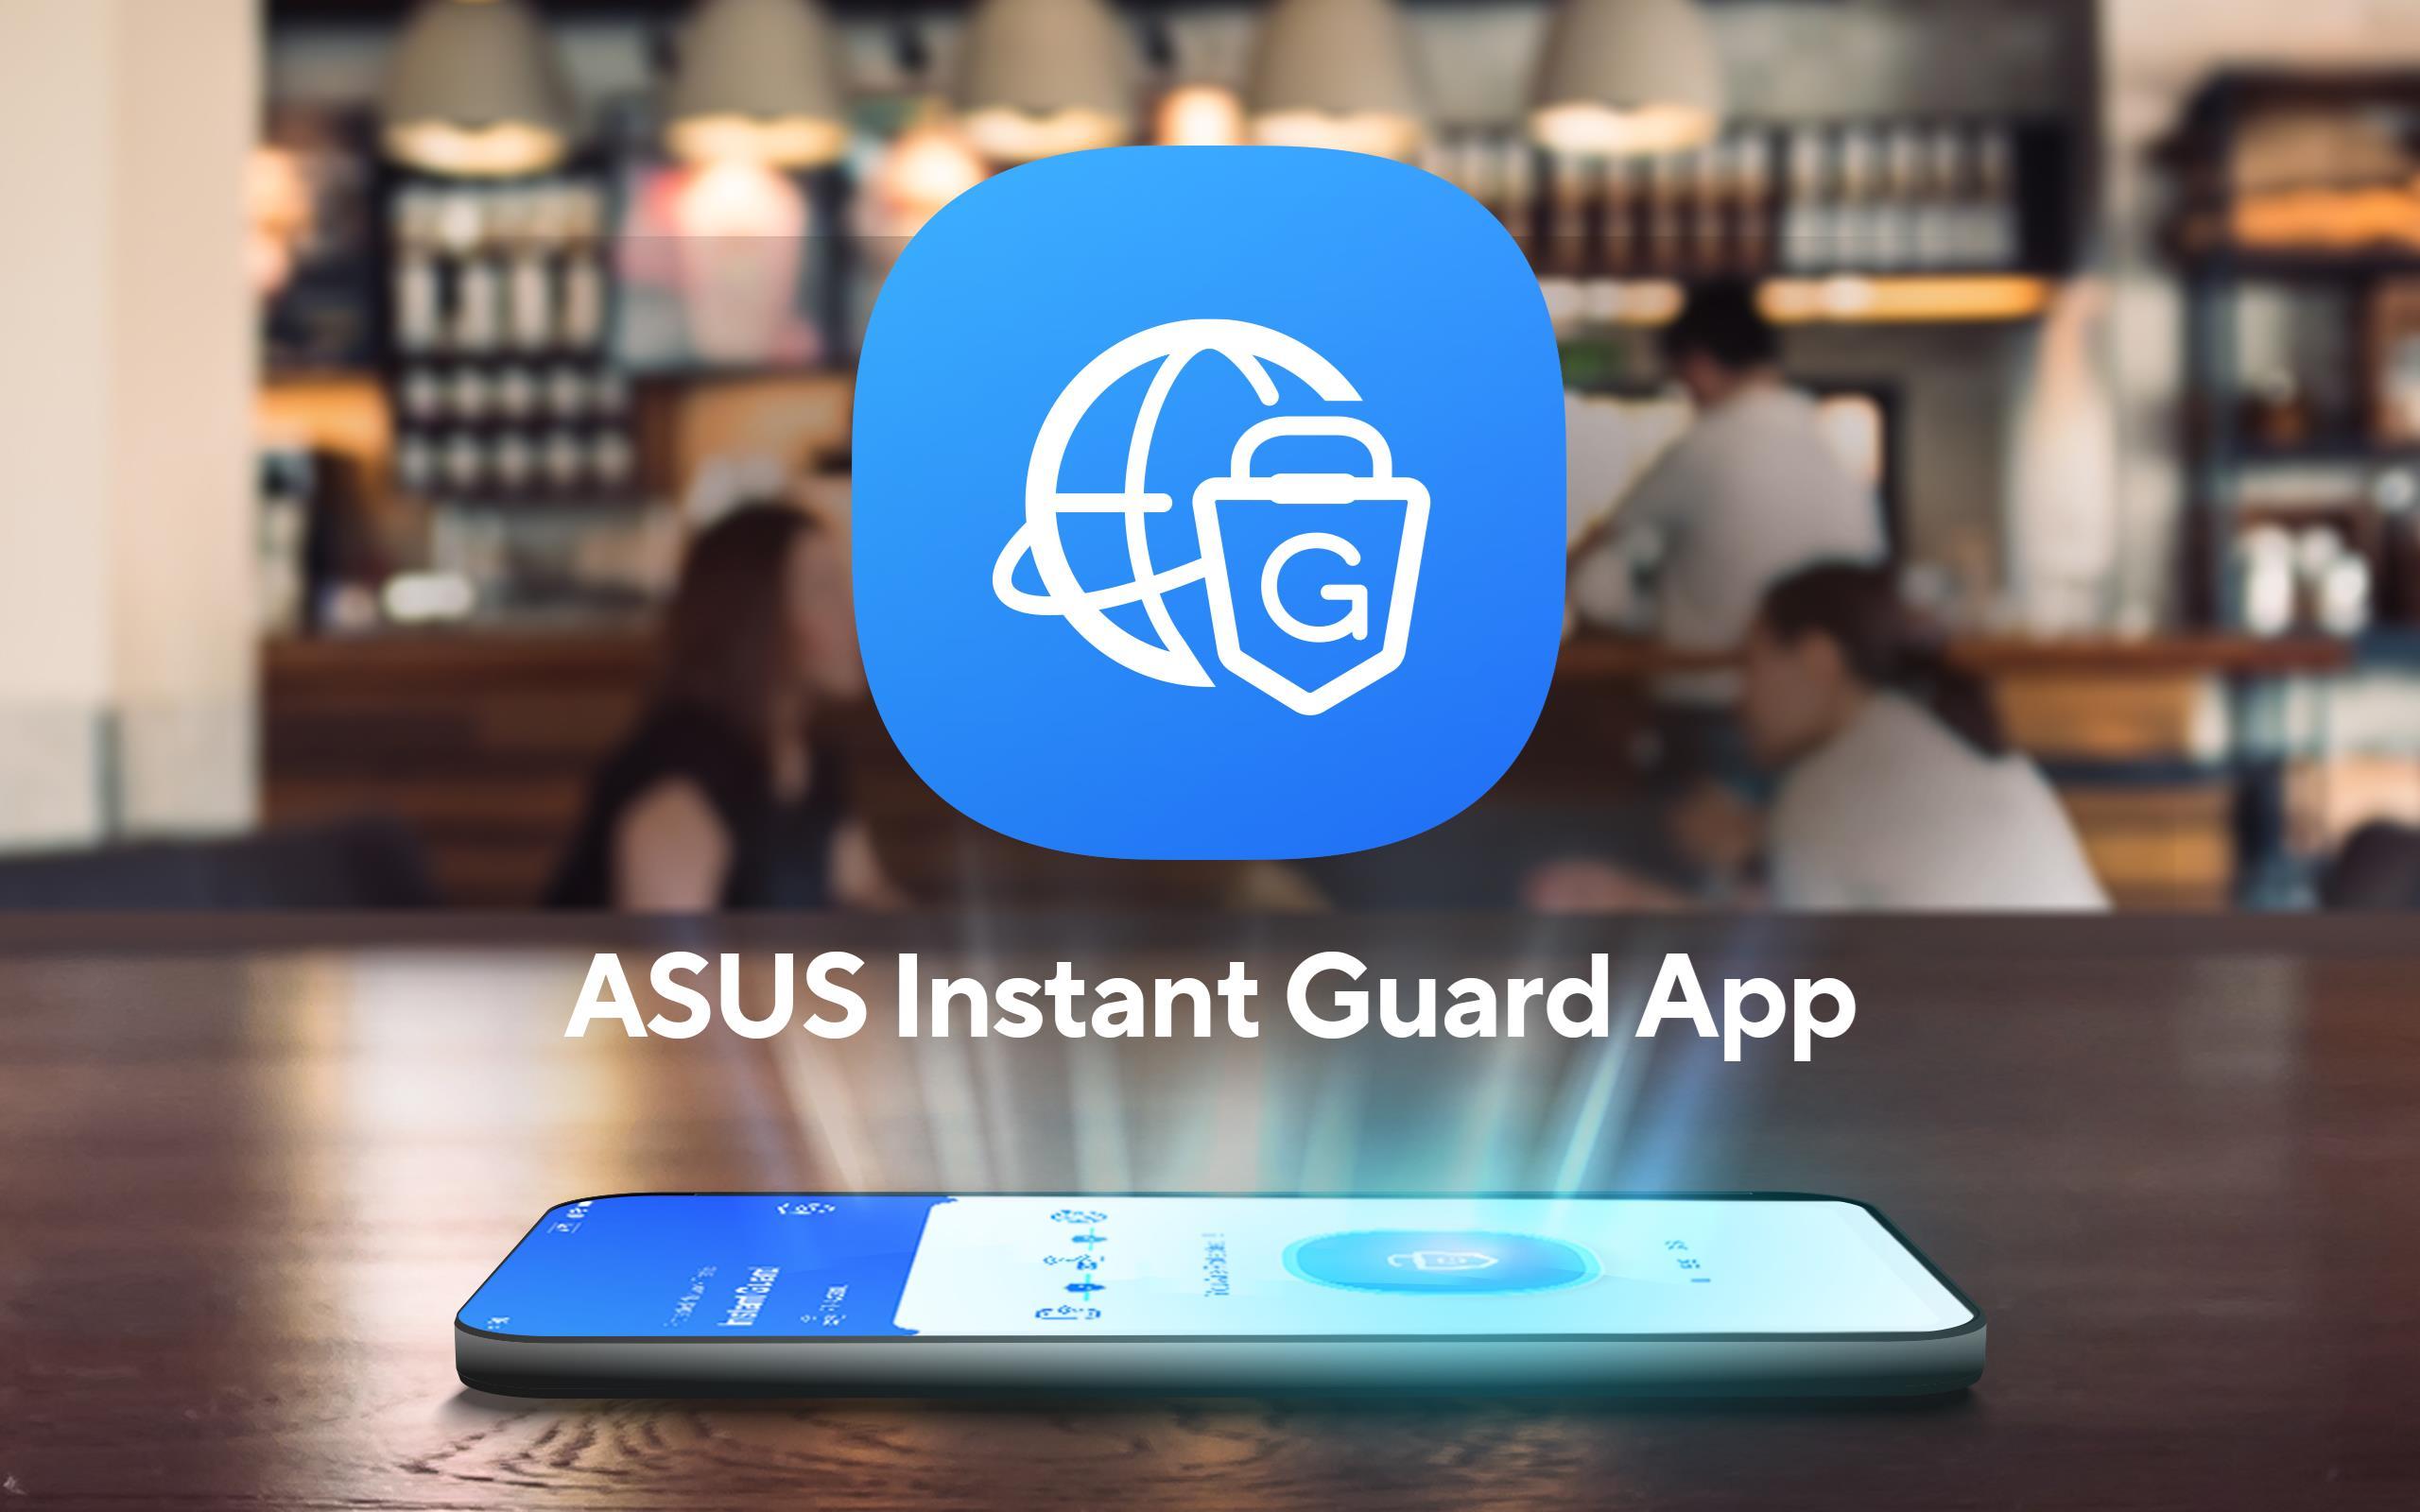 ASUS Instant Guard App